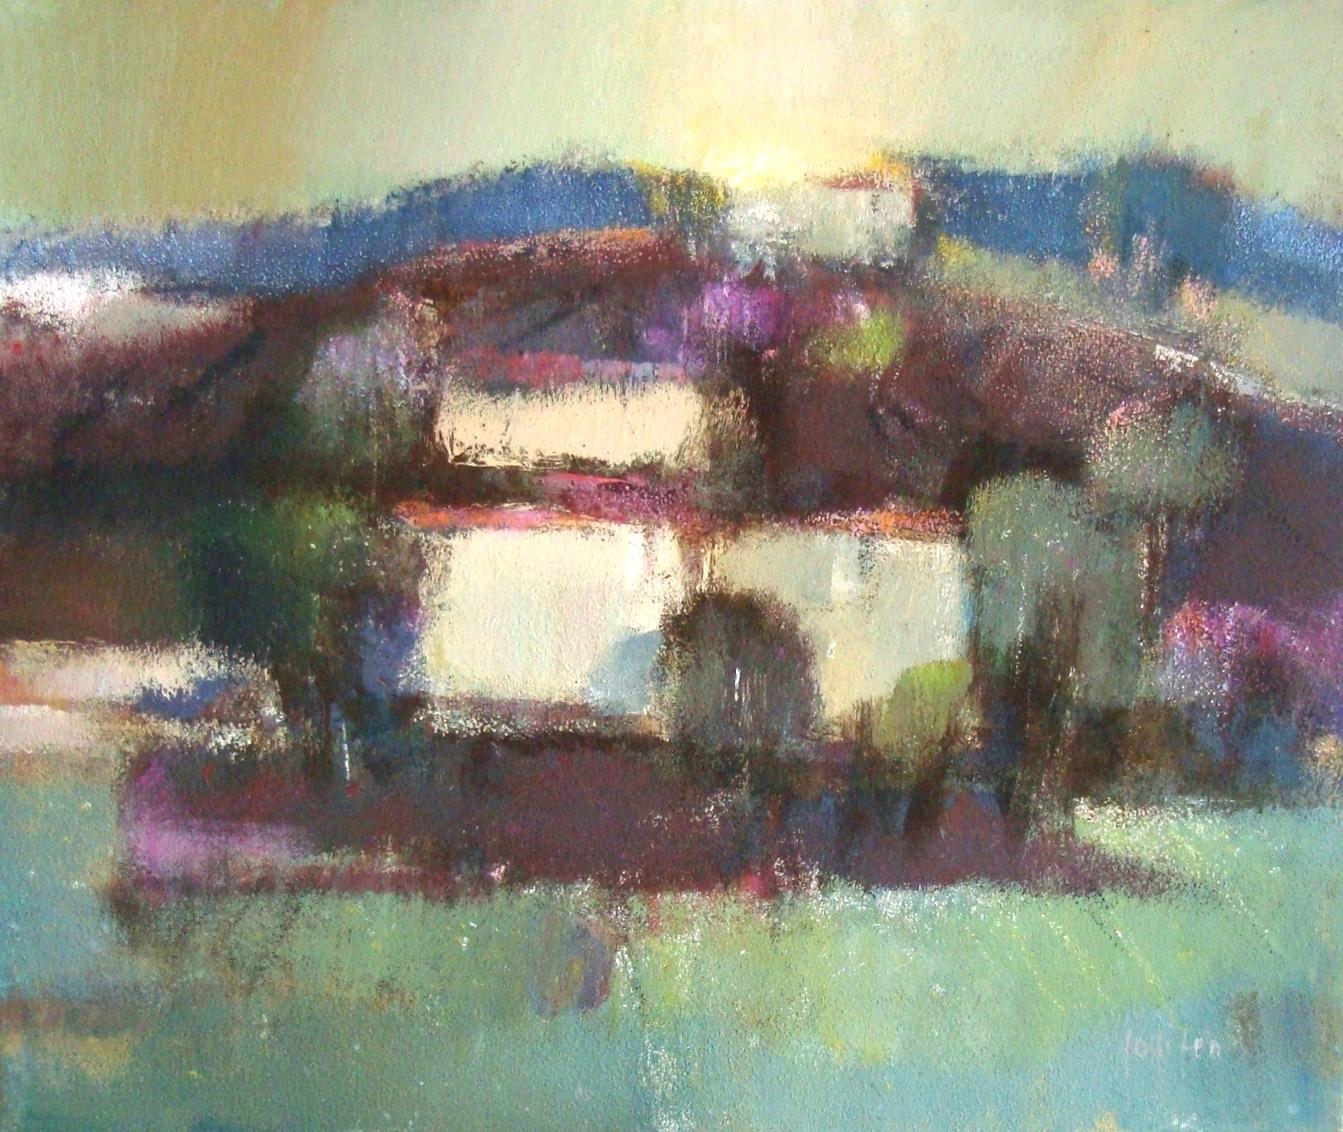 """Era di Primavera"" 1990 - Öl auf Leinwand - 50x60 cm"